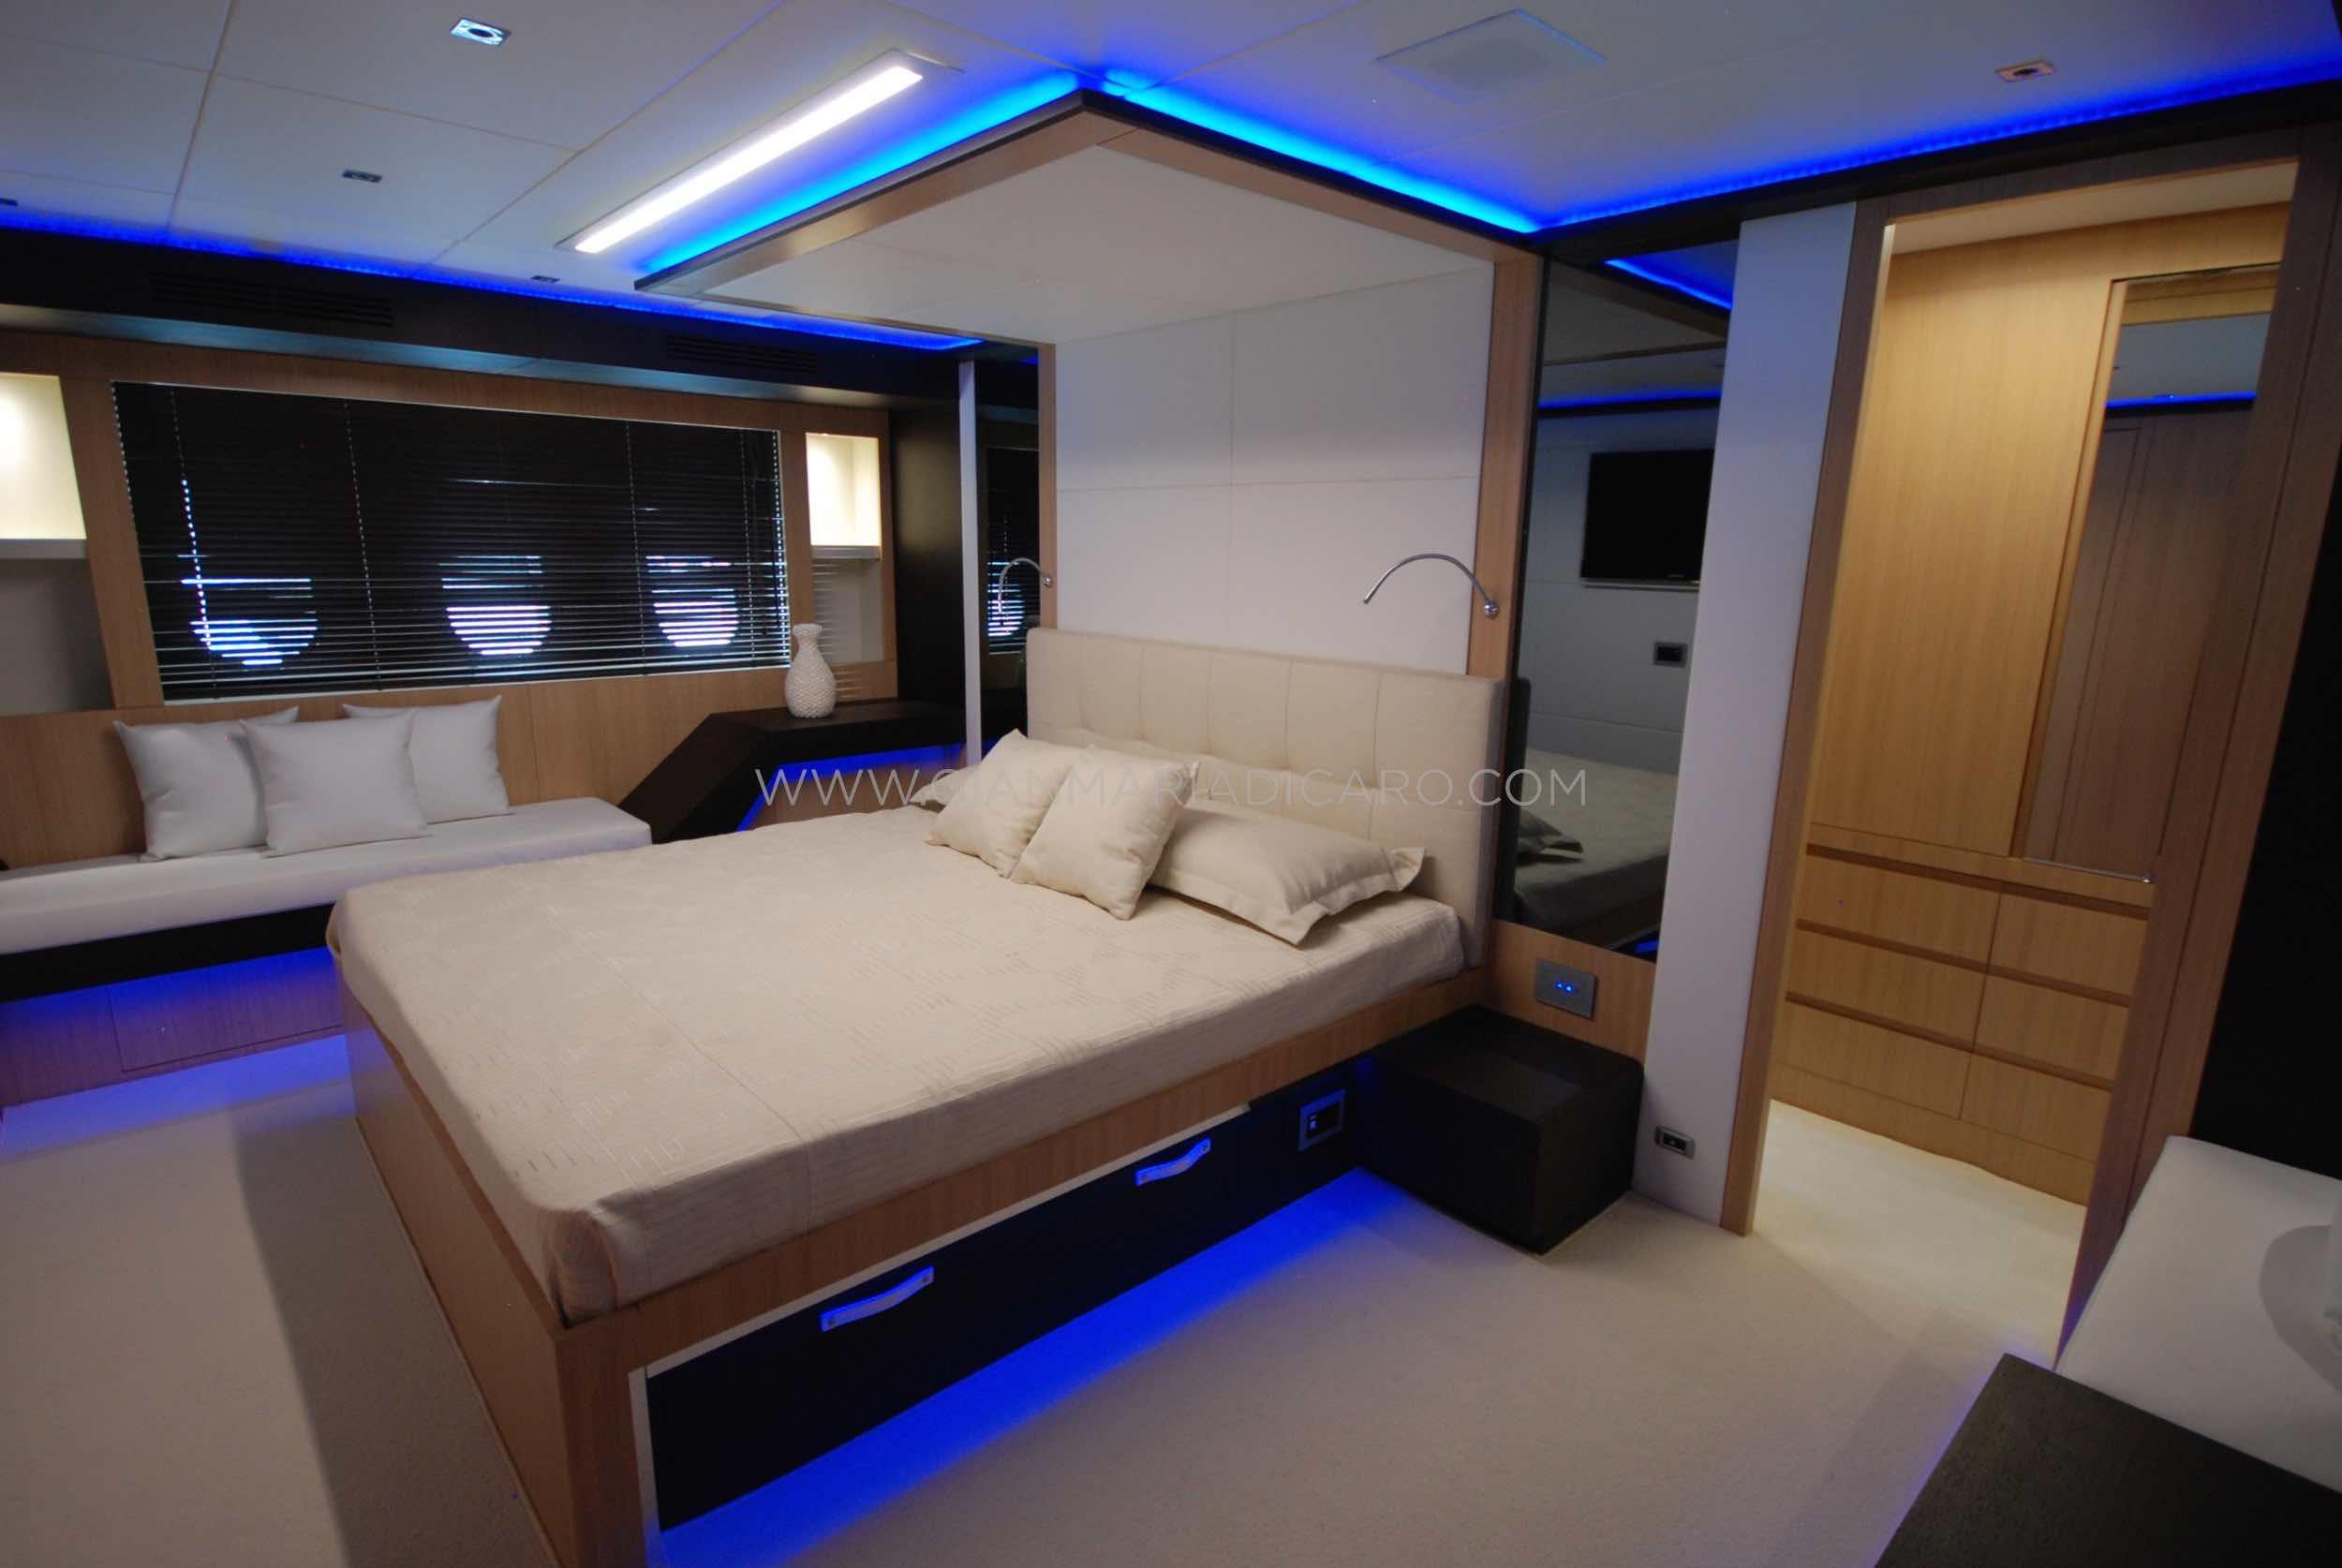 italian-yachts-jaguar-80-miss-11-for-sale-19.jpg